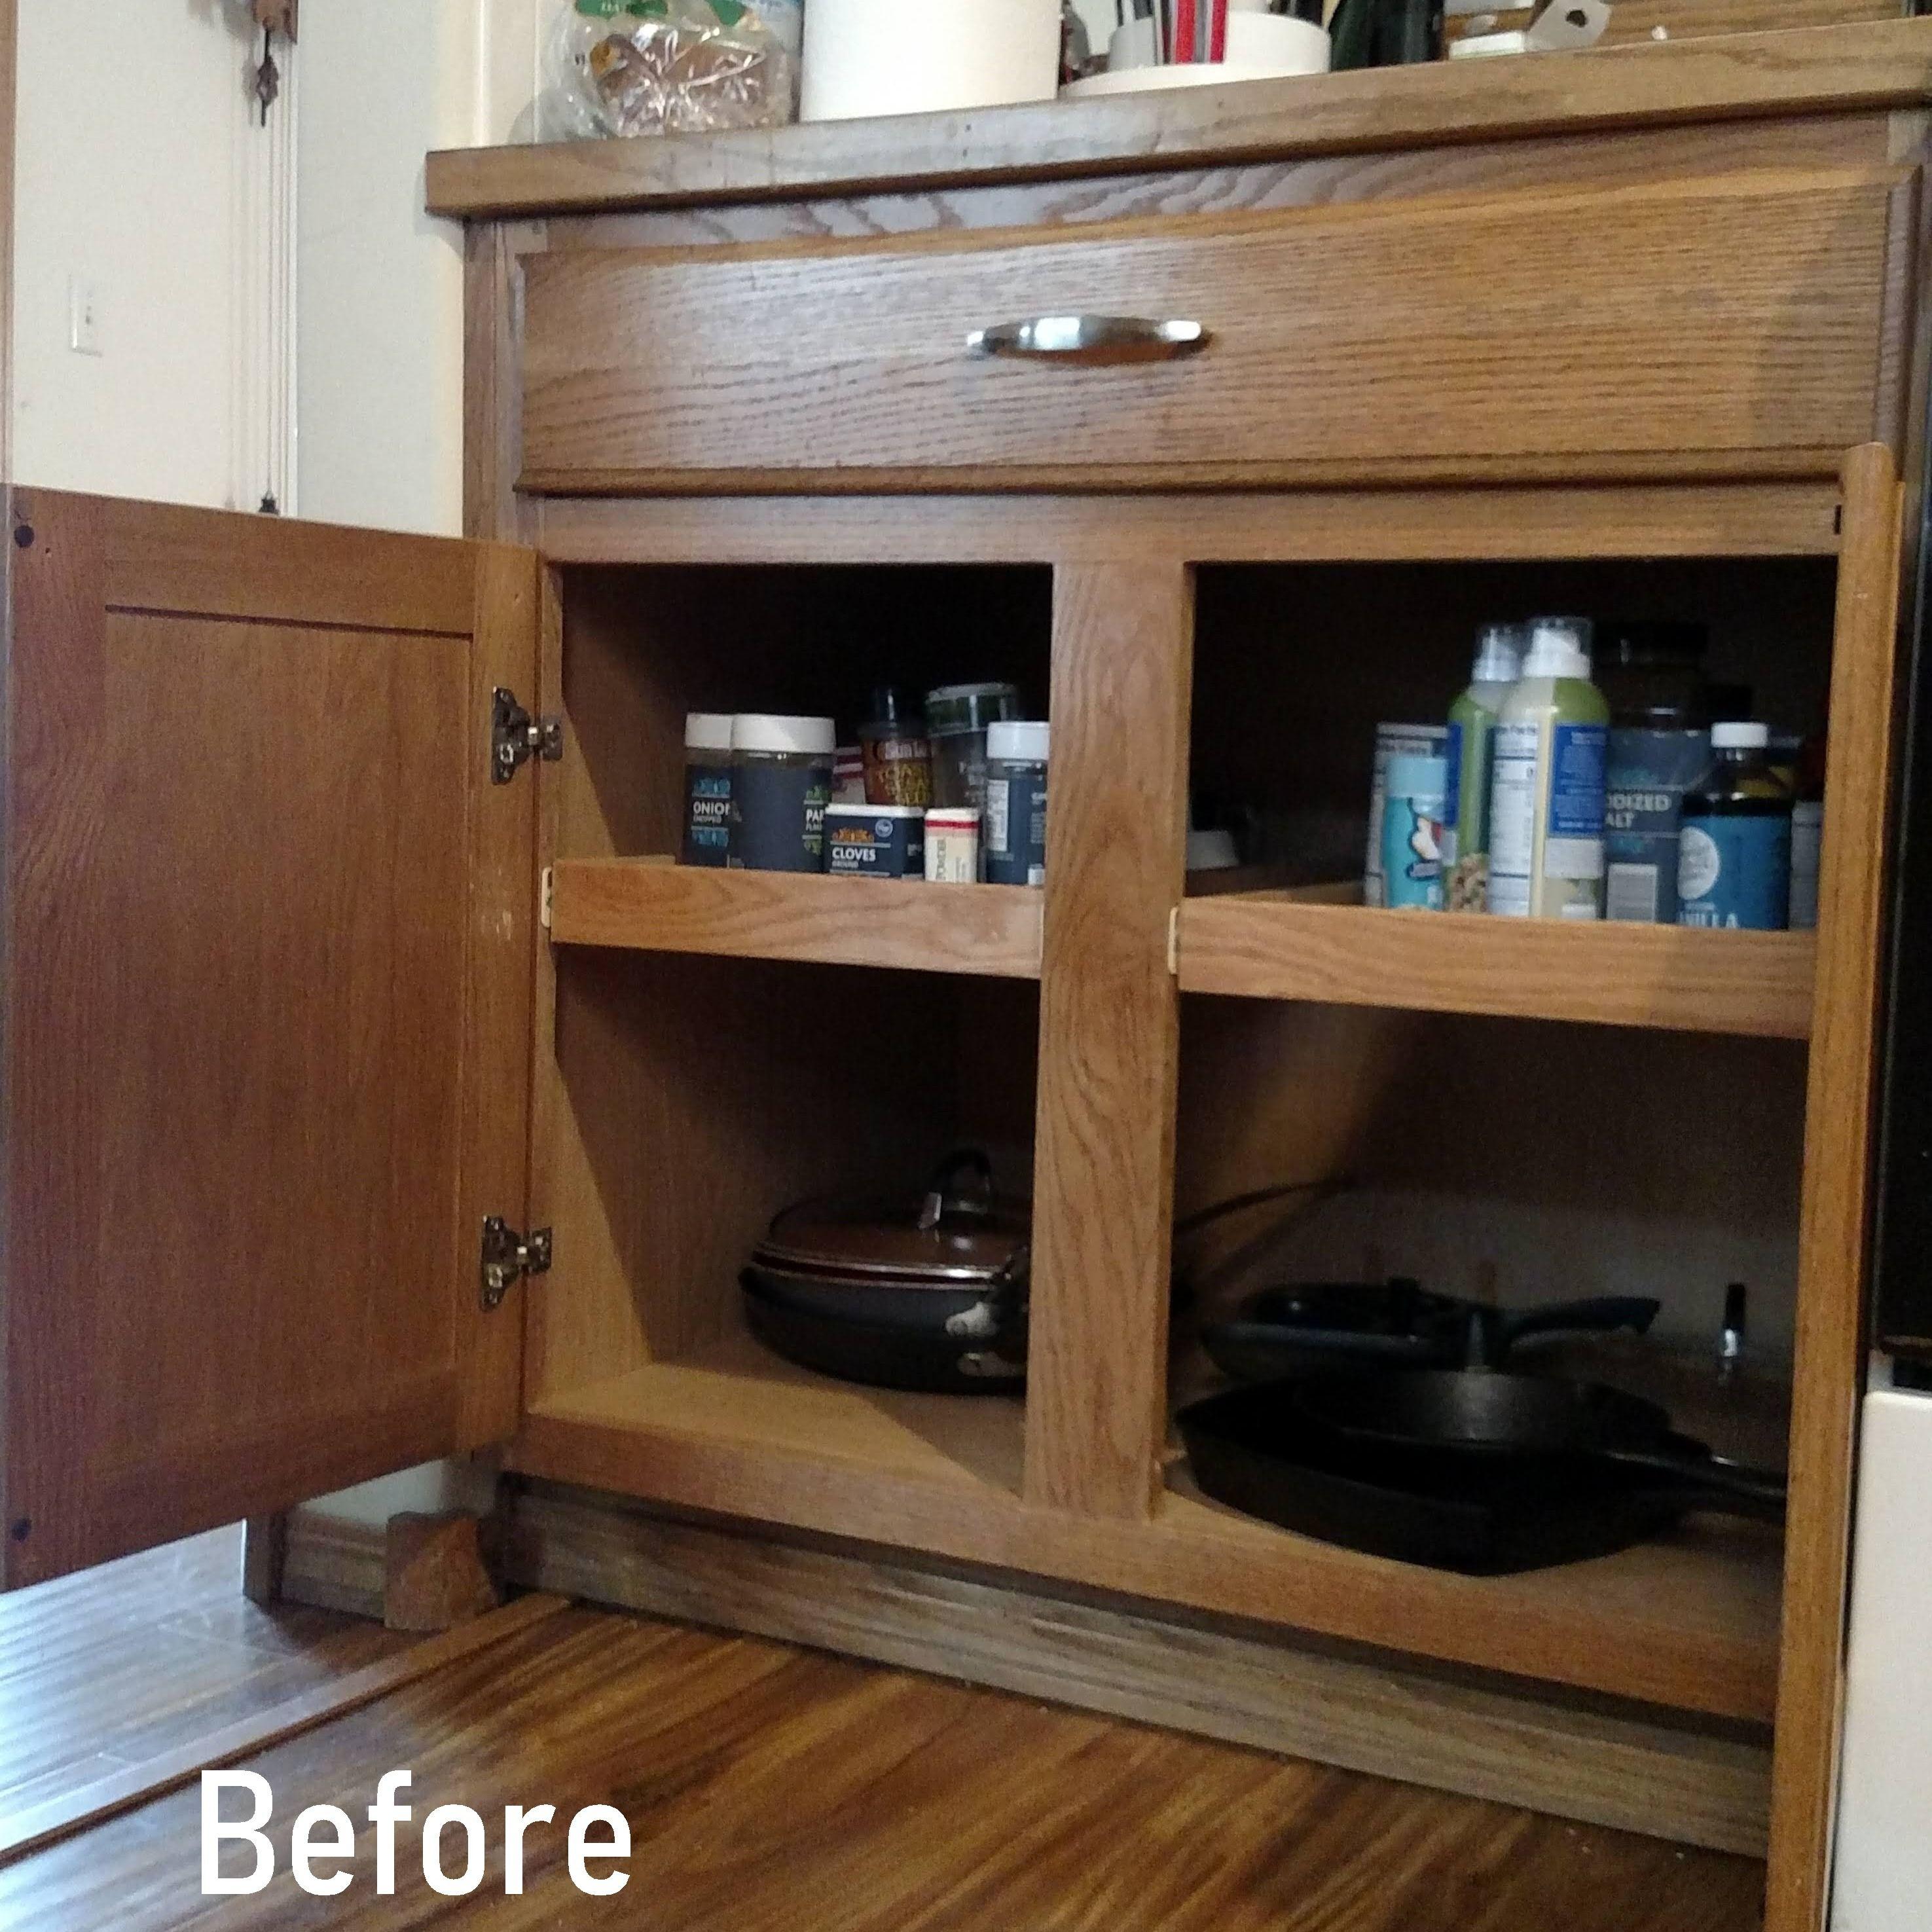 Before After Pull Out Shelf Install Shelves Shelf Organization Cabinet Doors